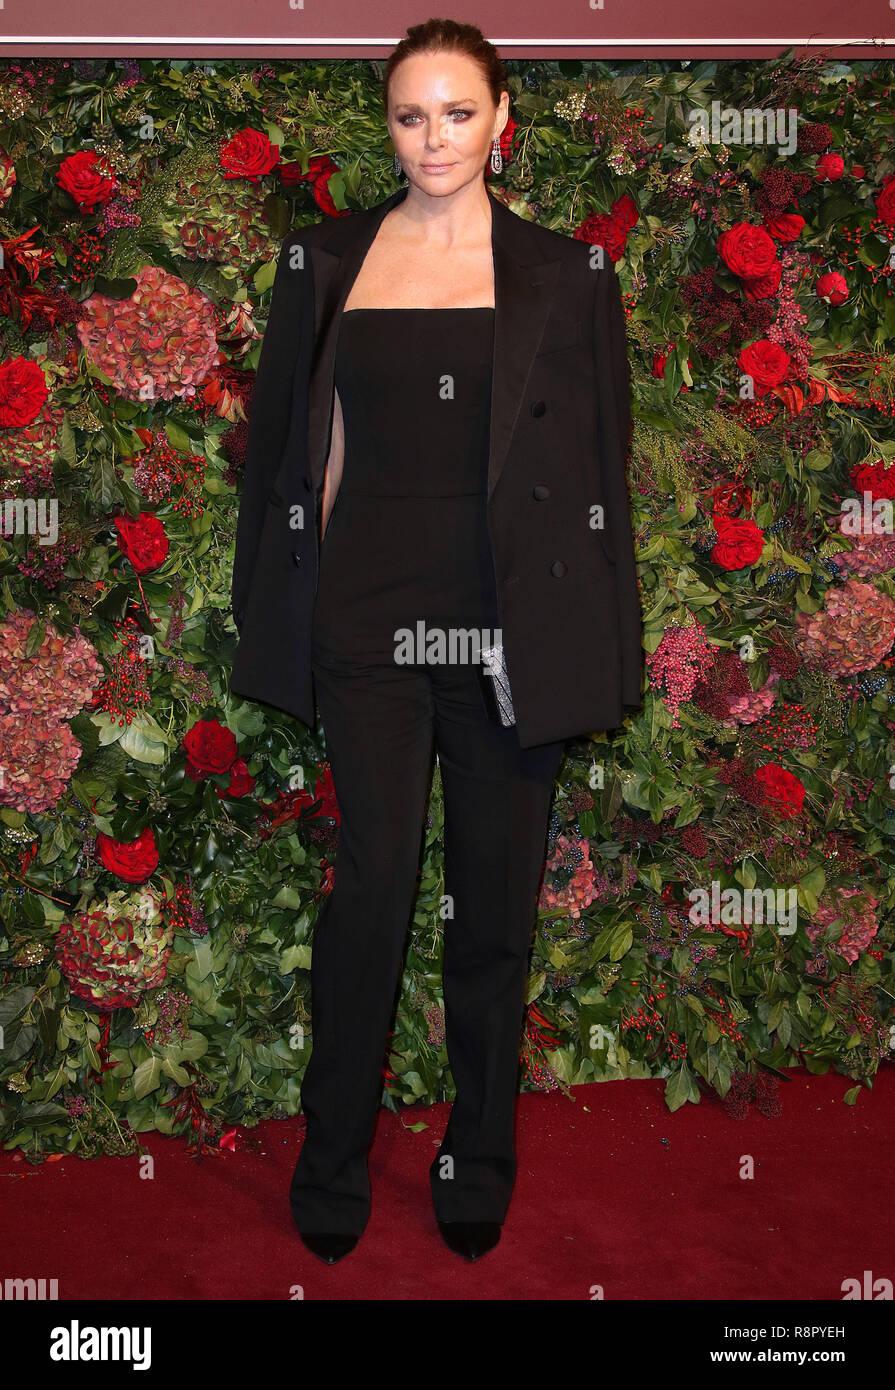 Nov 18, 2018  - Stella McCartney attending 64th Evening Standard Theatre Awards, Theatre Royal Drury Lane in London, UK - Stock Image